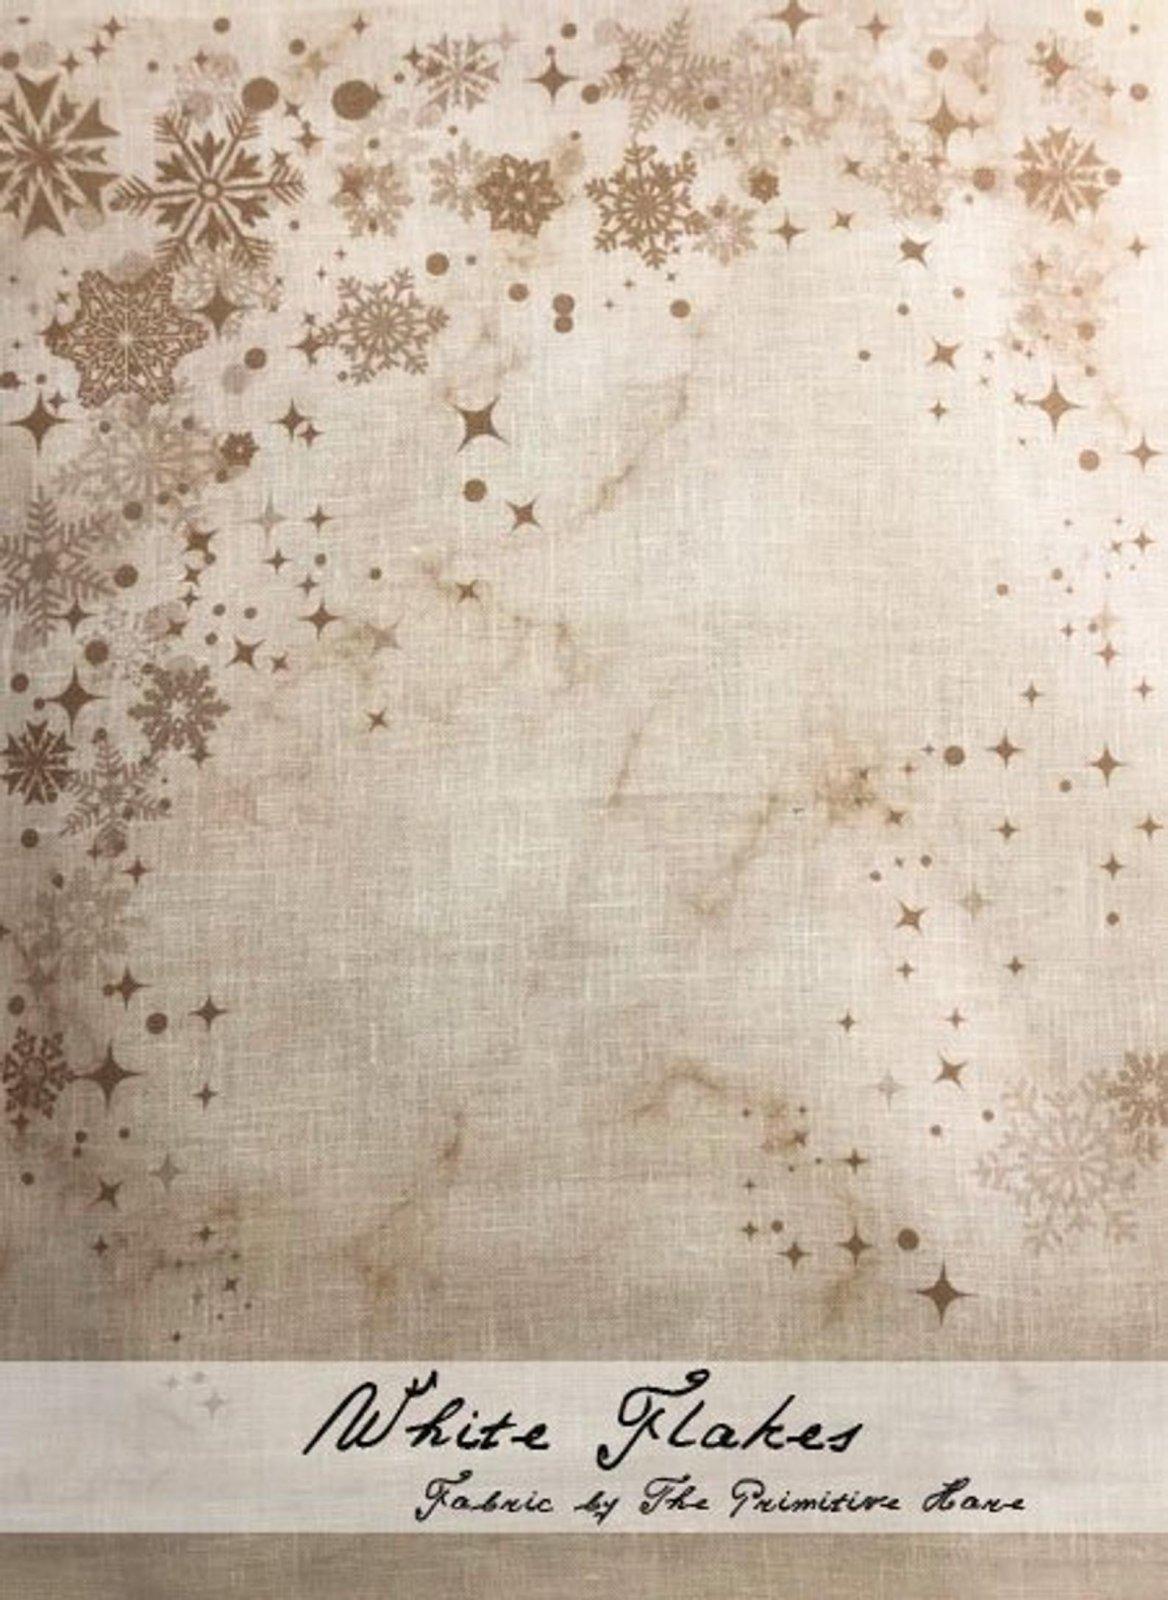 Primitive Hare - White Flakes Linen 30ct color